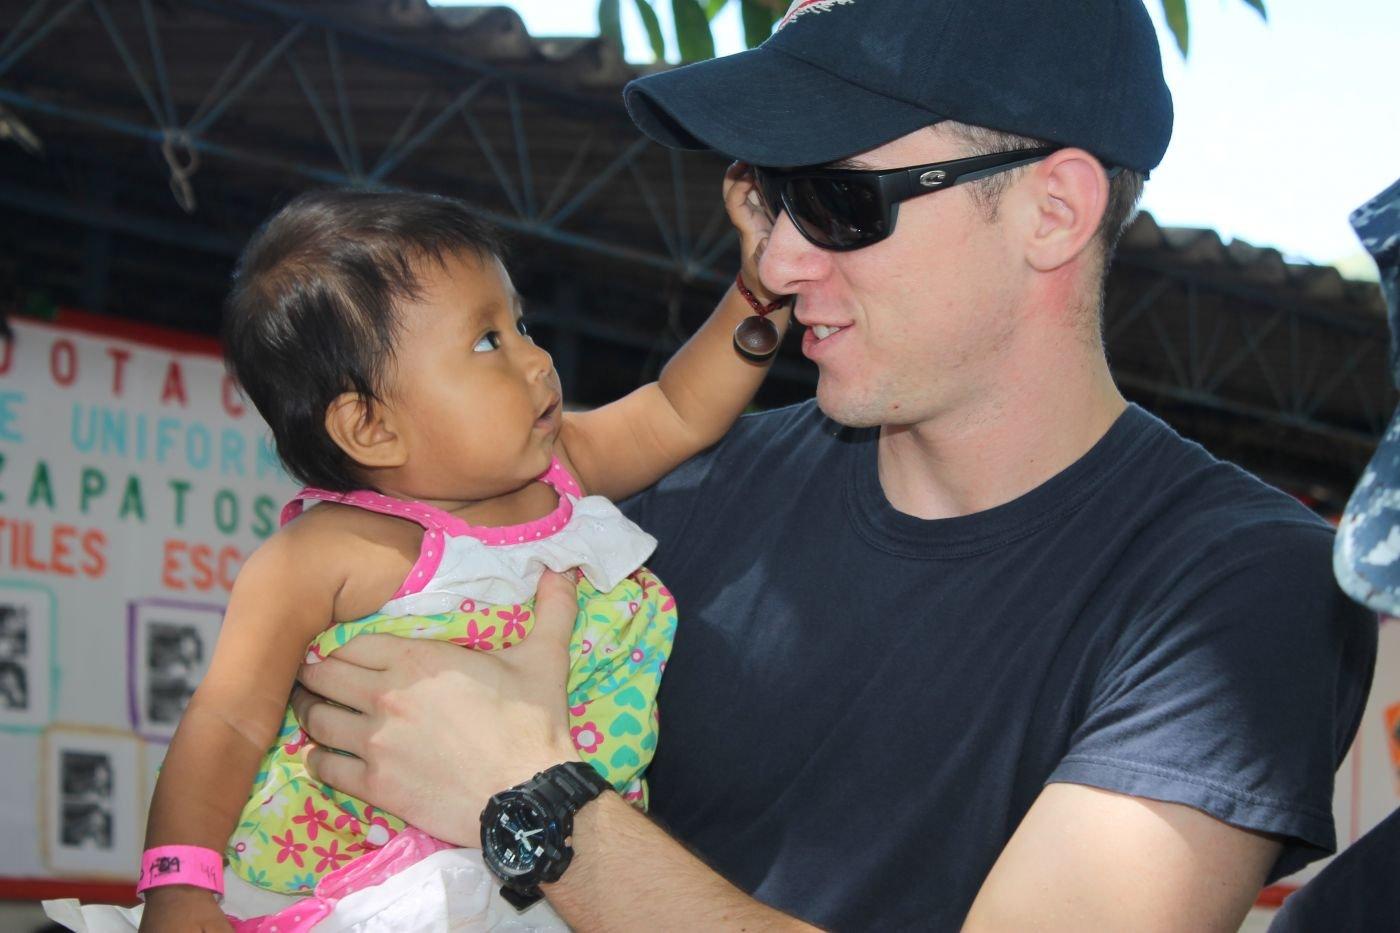 USNS Comfort Brings 'Continuing Promise' Humanitarian Mission to El Salvador